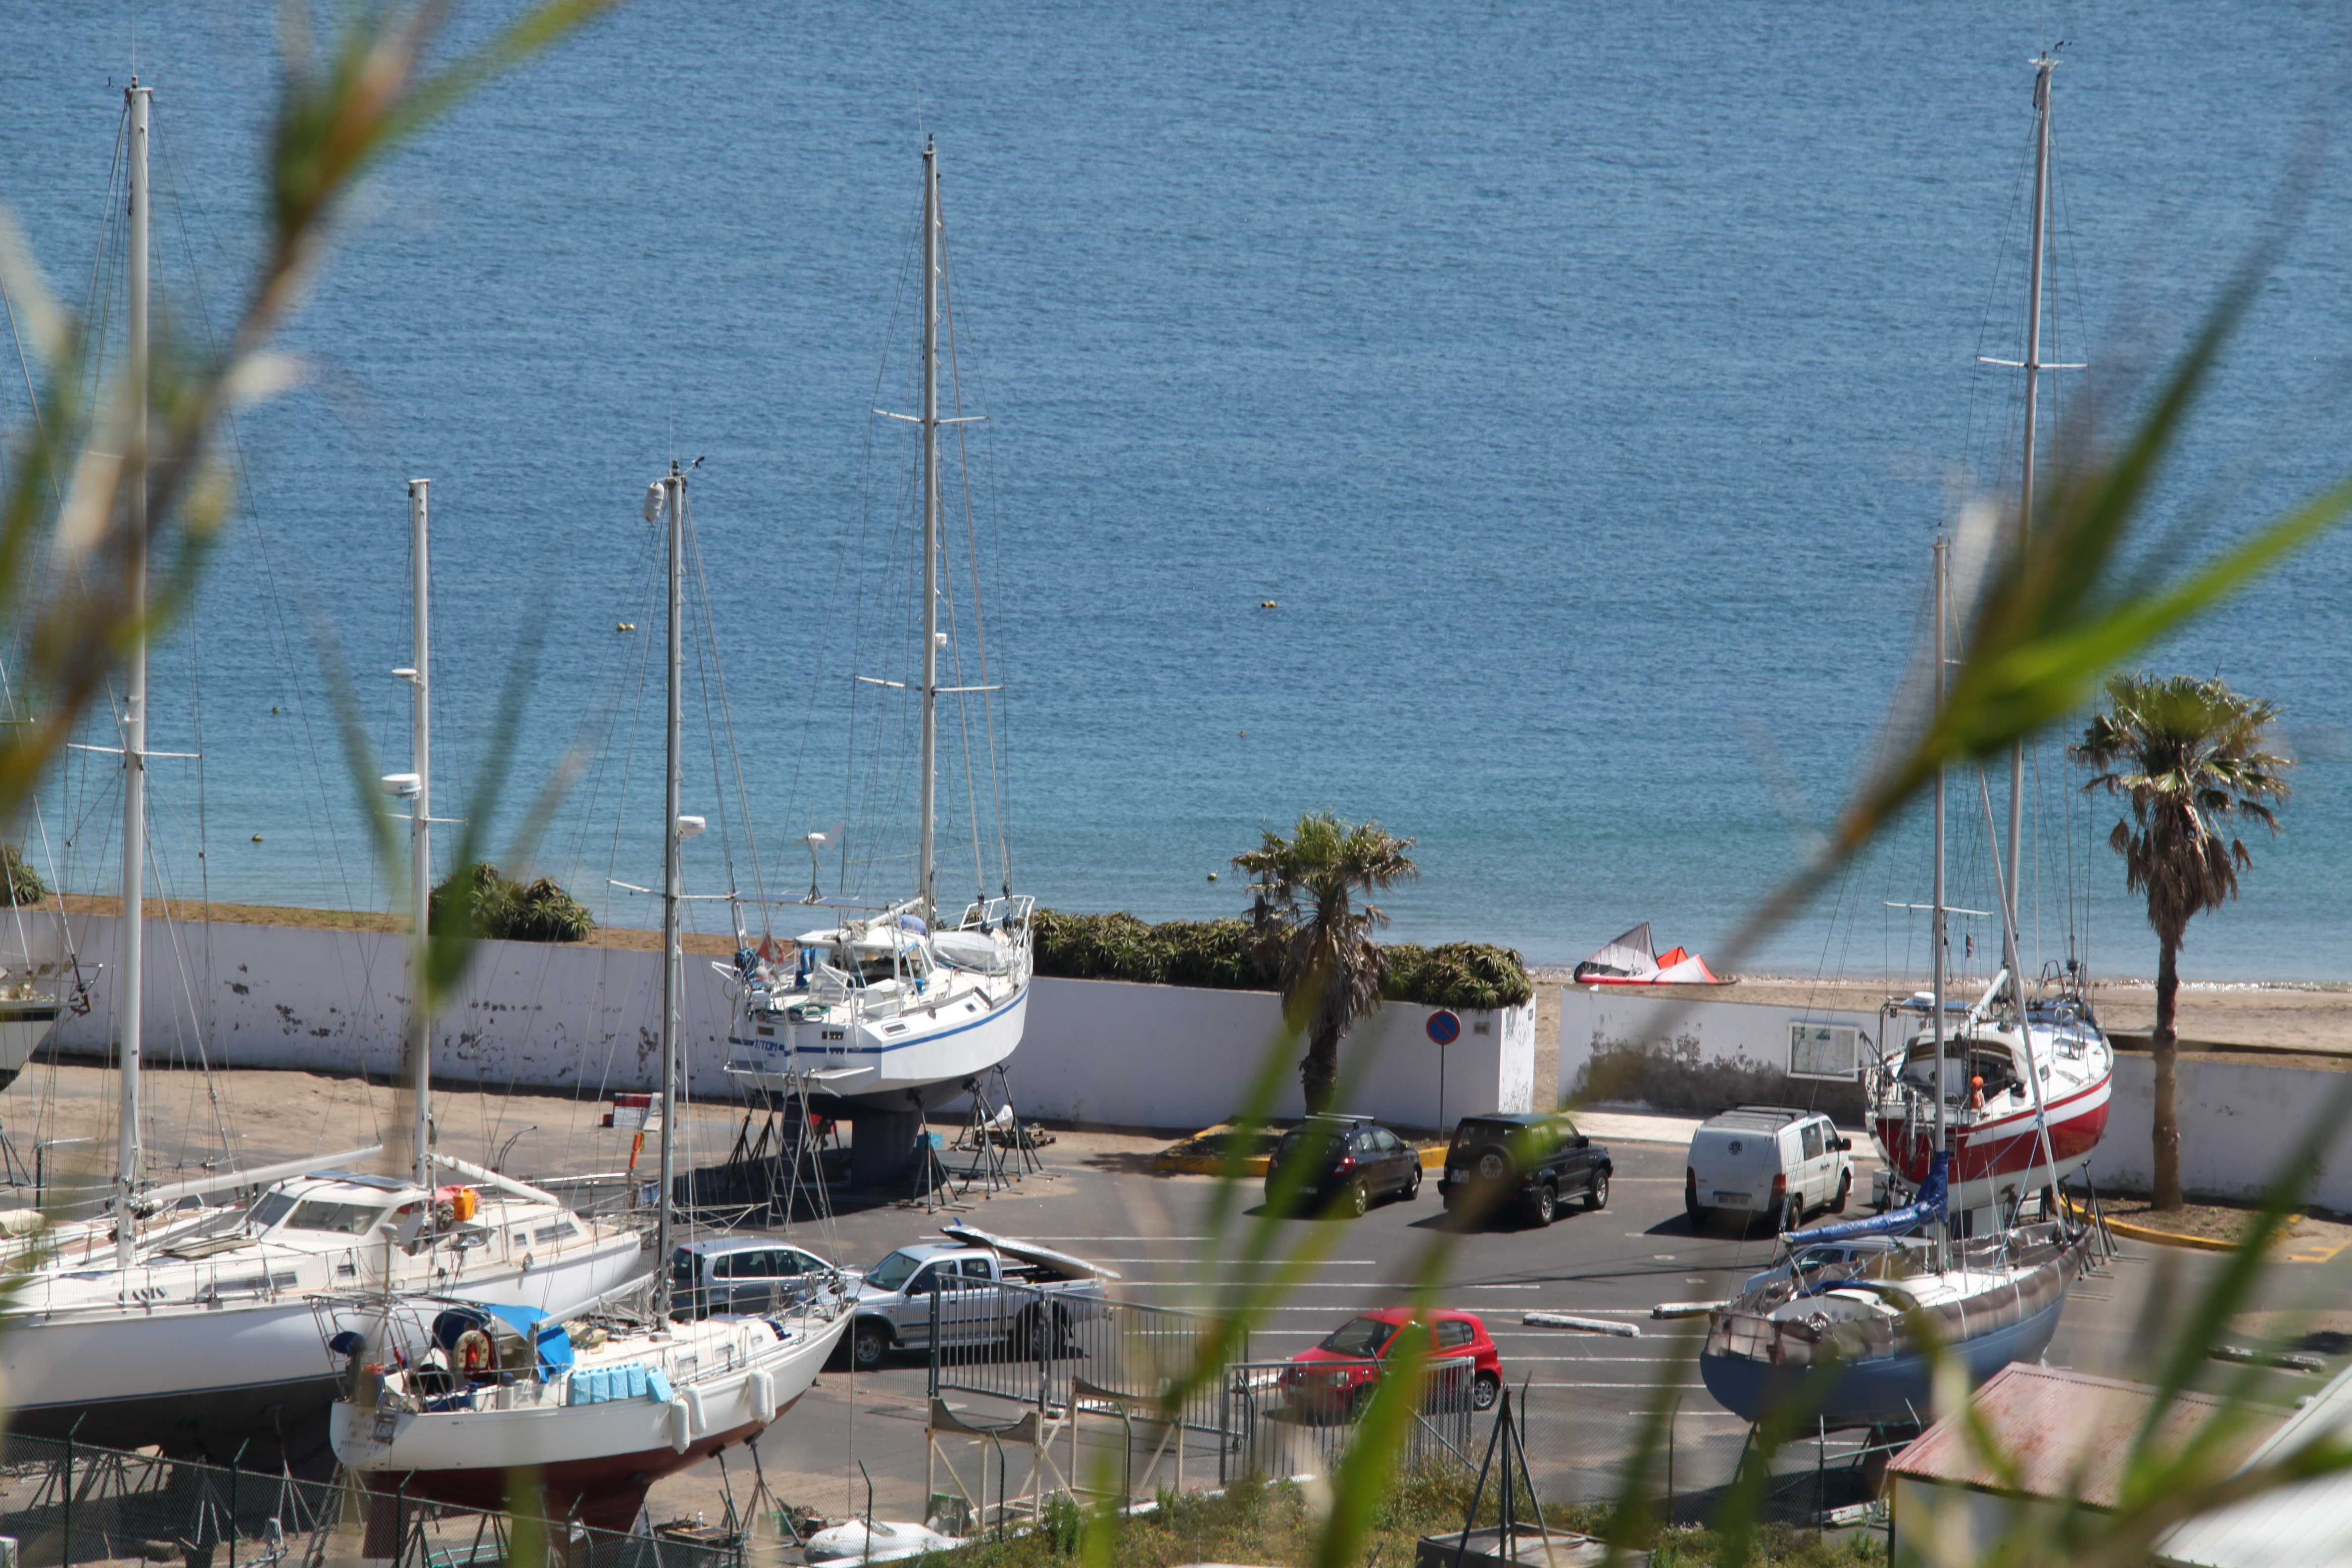 Praia de Vitoria, Terceira